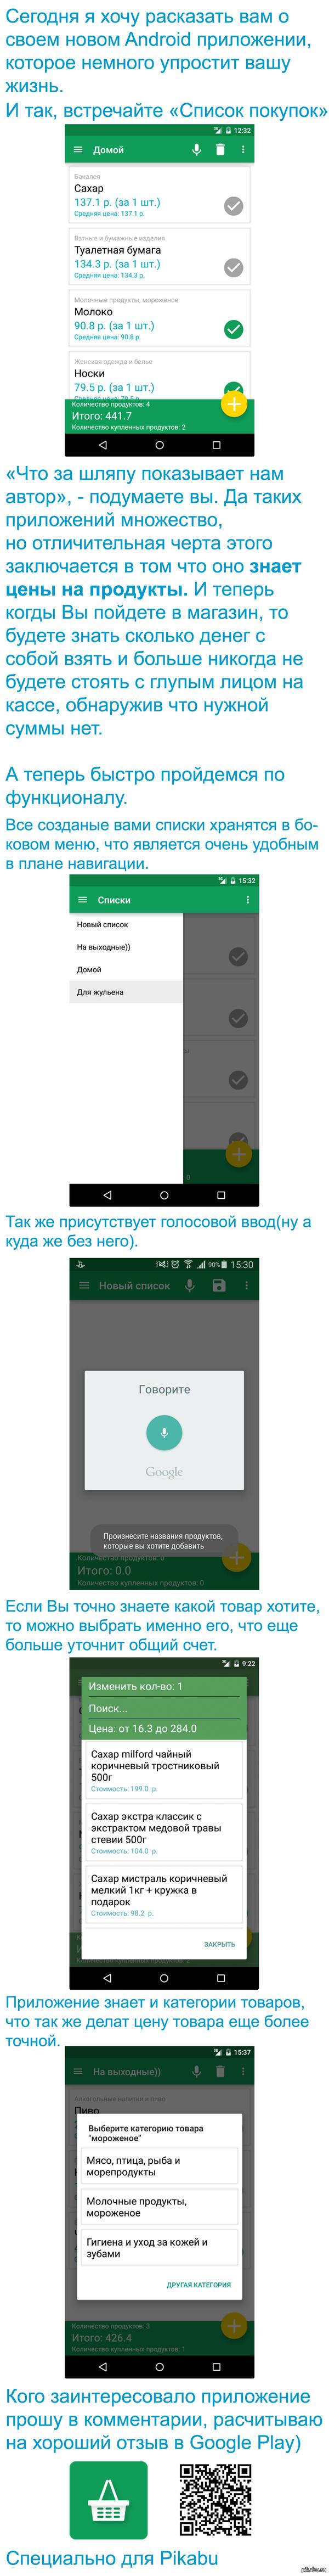 Первое приложение) https://play.google.com/store/apps/details?id=com.kamil.voyaker.listofpurchases